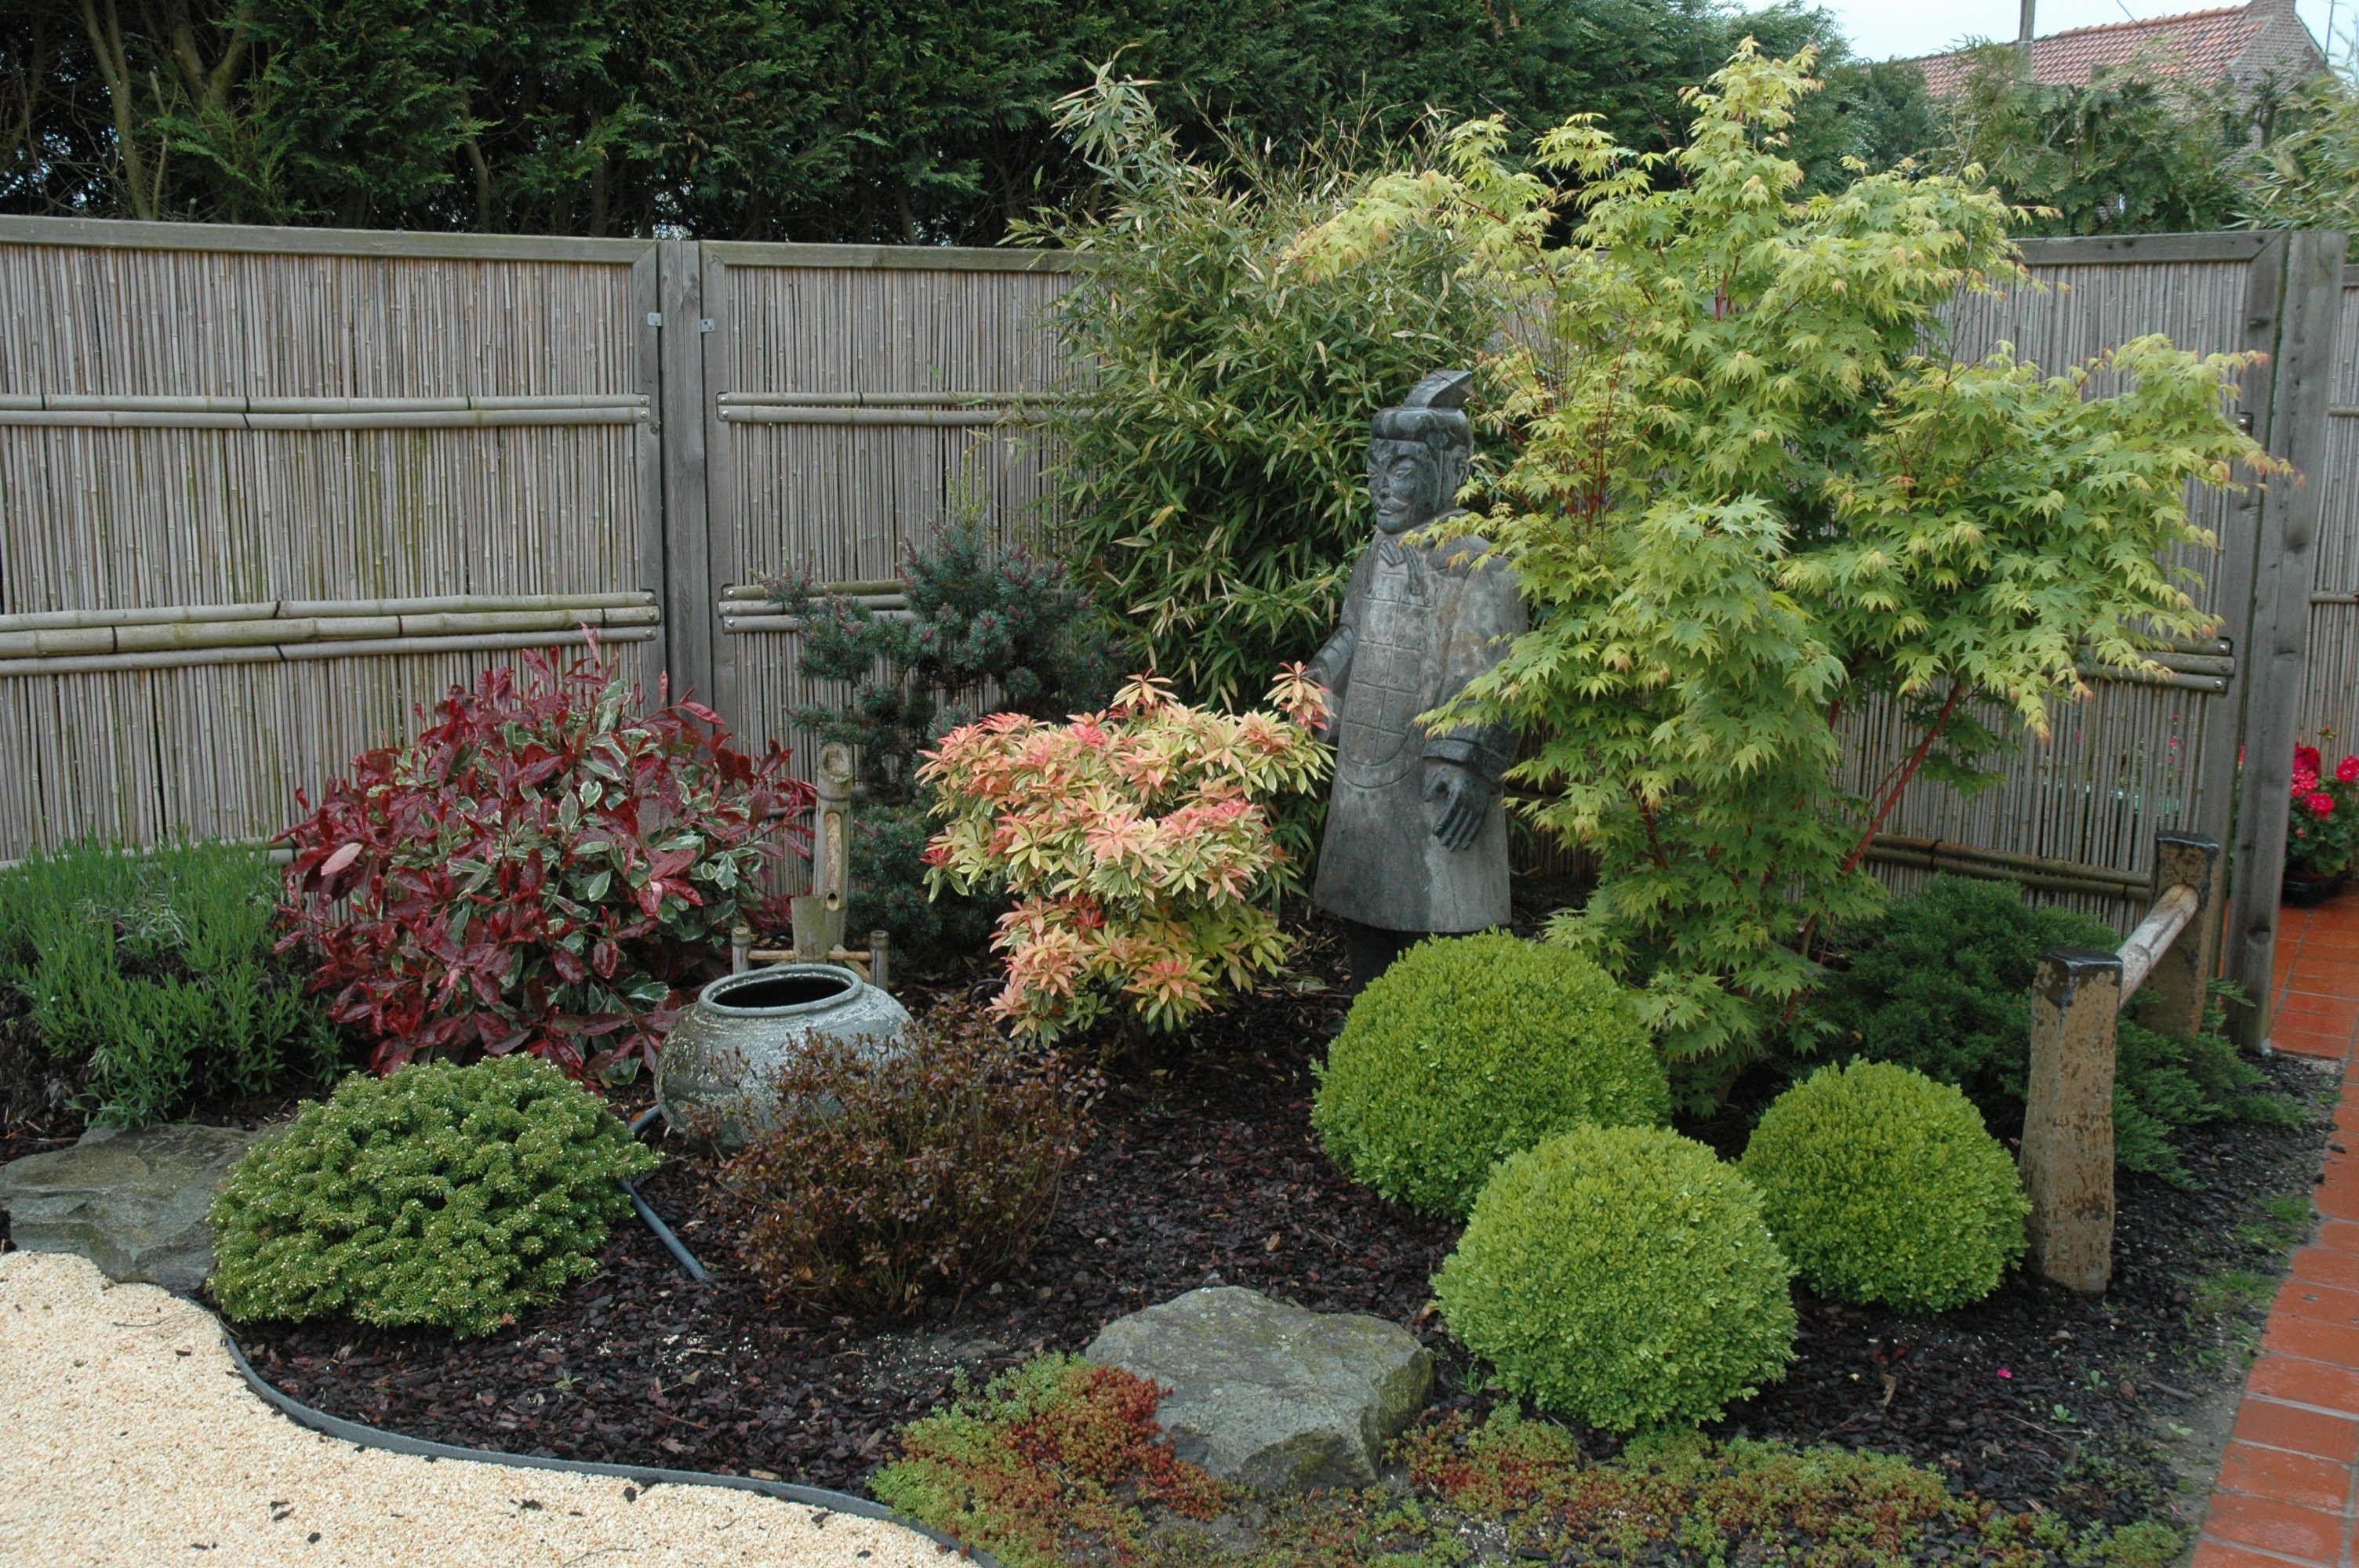 Pin by Girard on Jardin japonais | Pinterest | Gardens